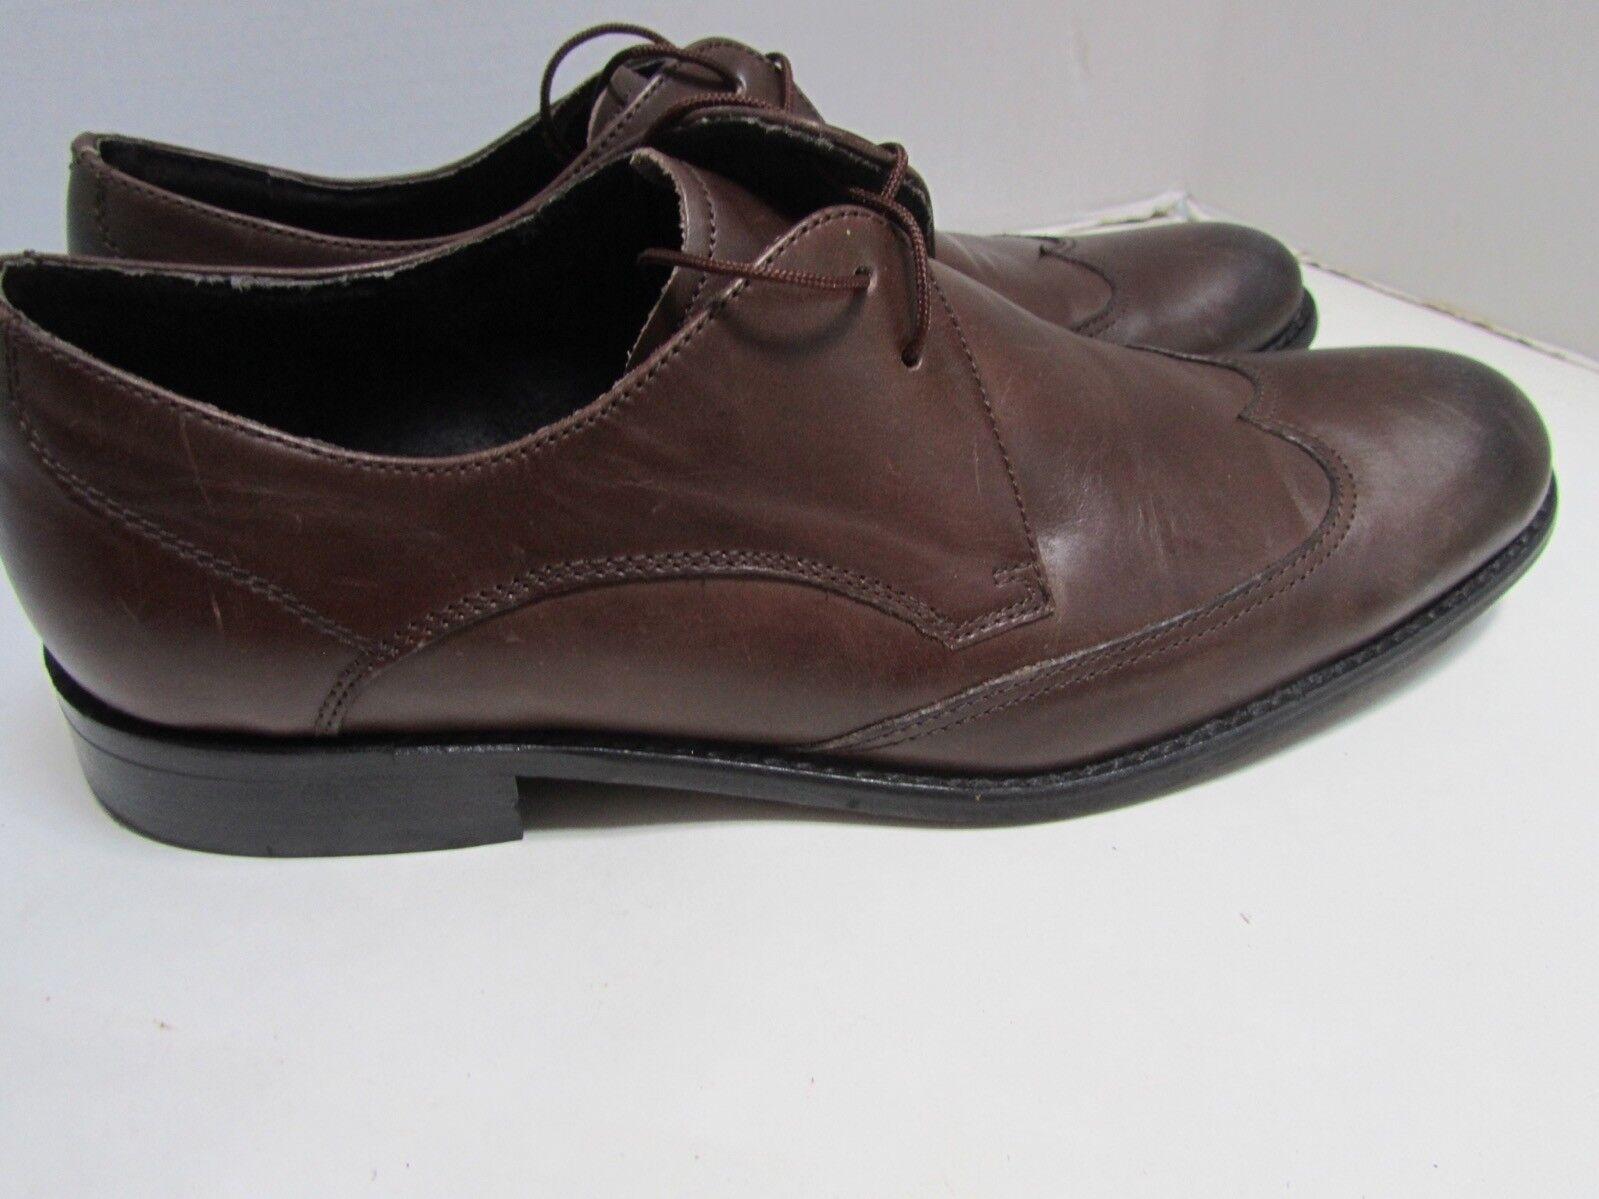 John Varvatos braun Leather Wingtip Wingtip Wingtip Oxfords Loafers schuhe Ombre 8 EXC 5fc72d